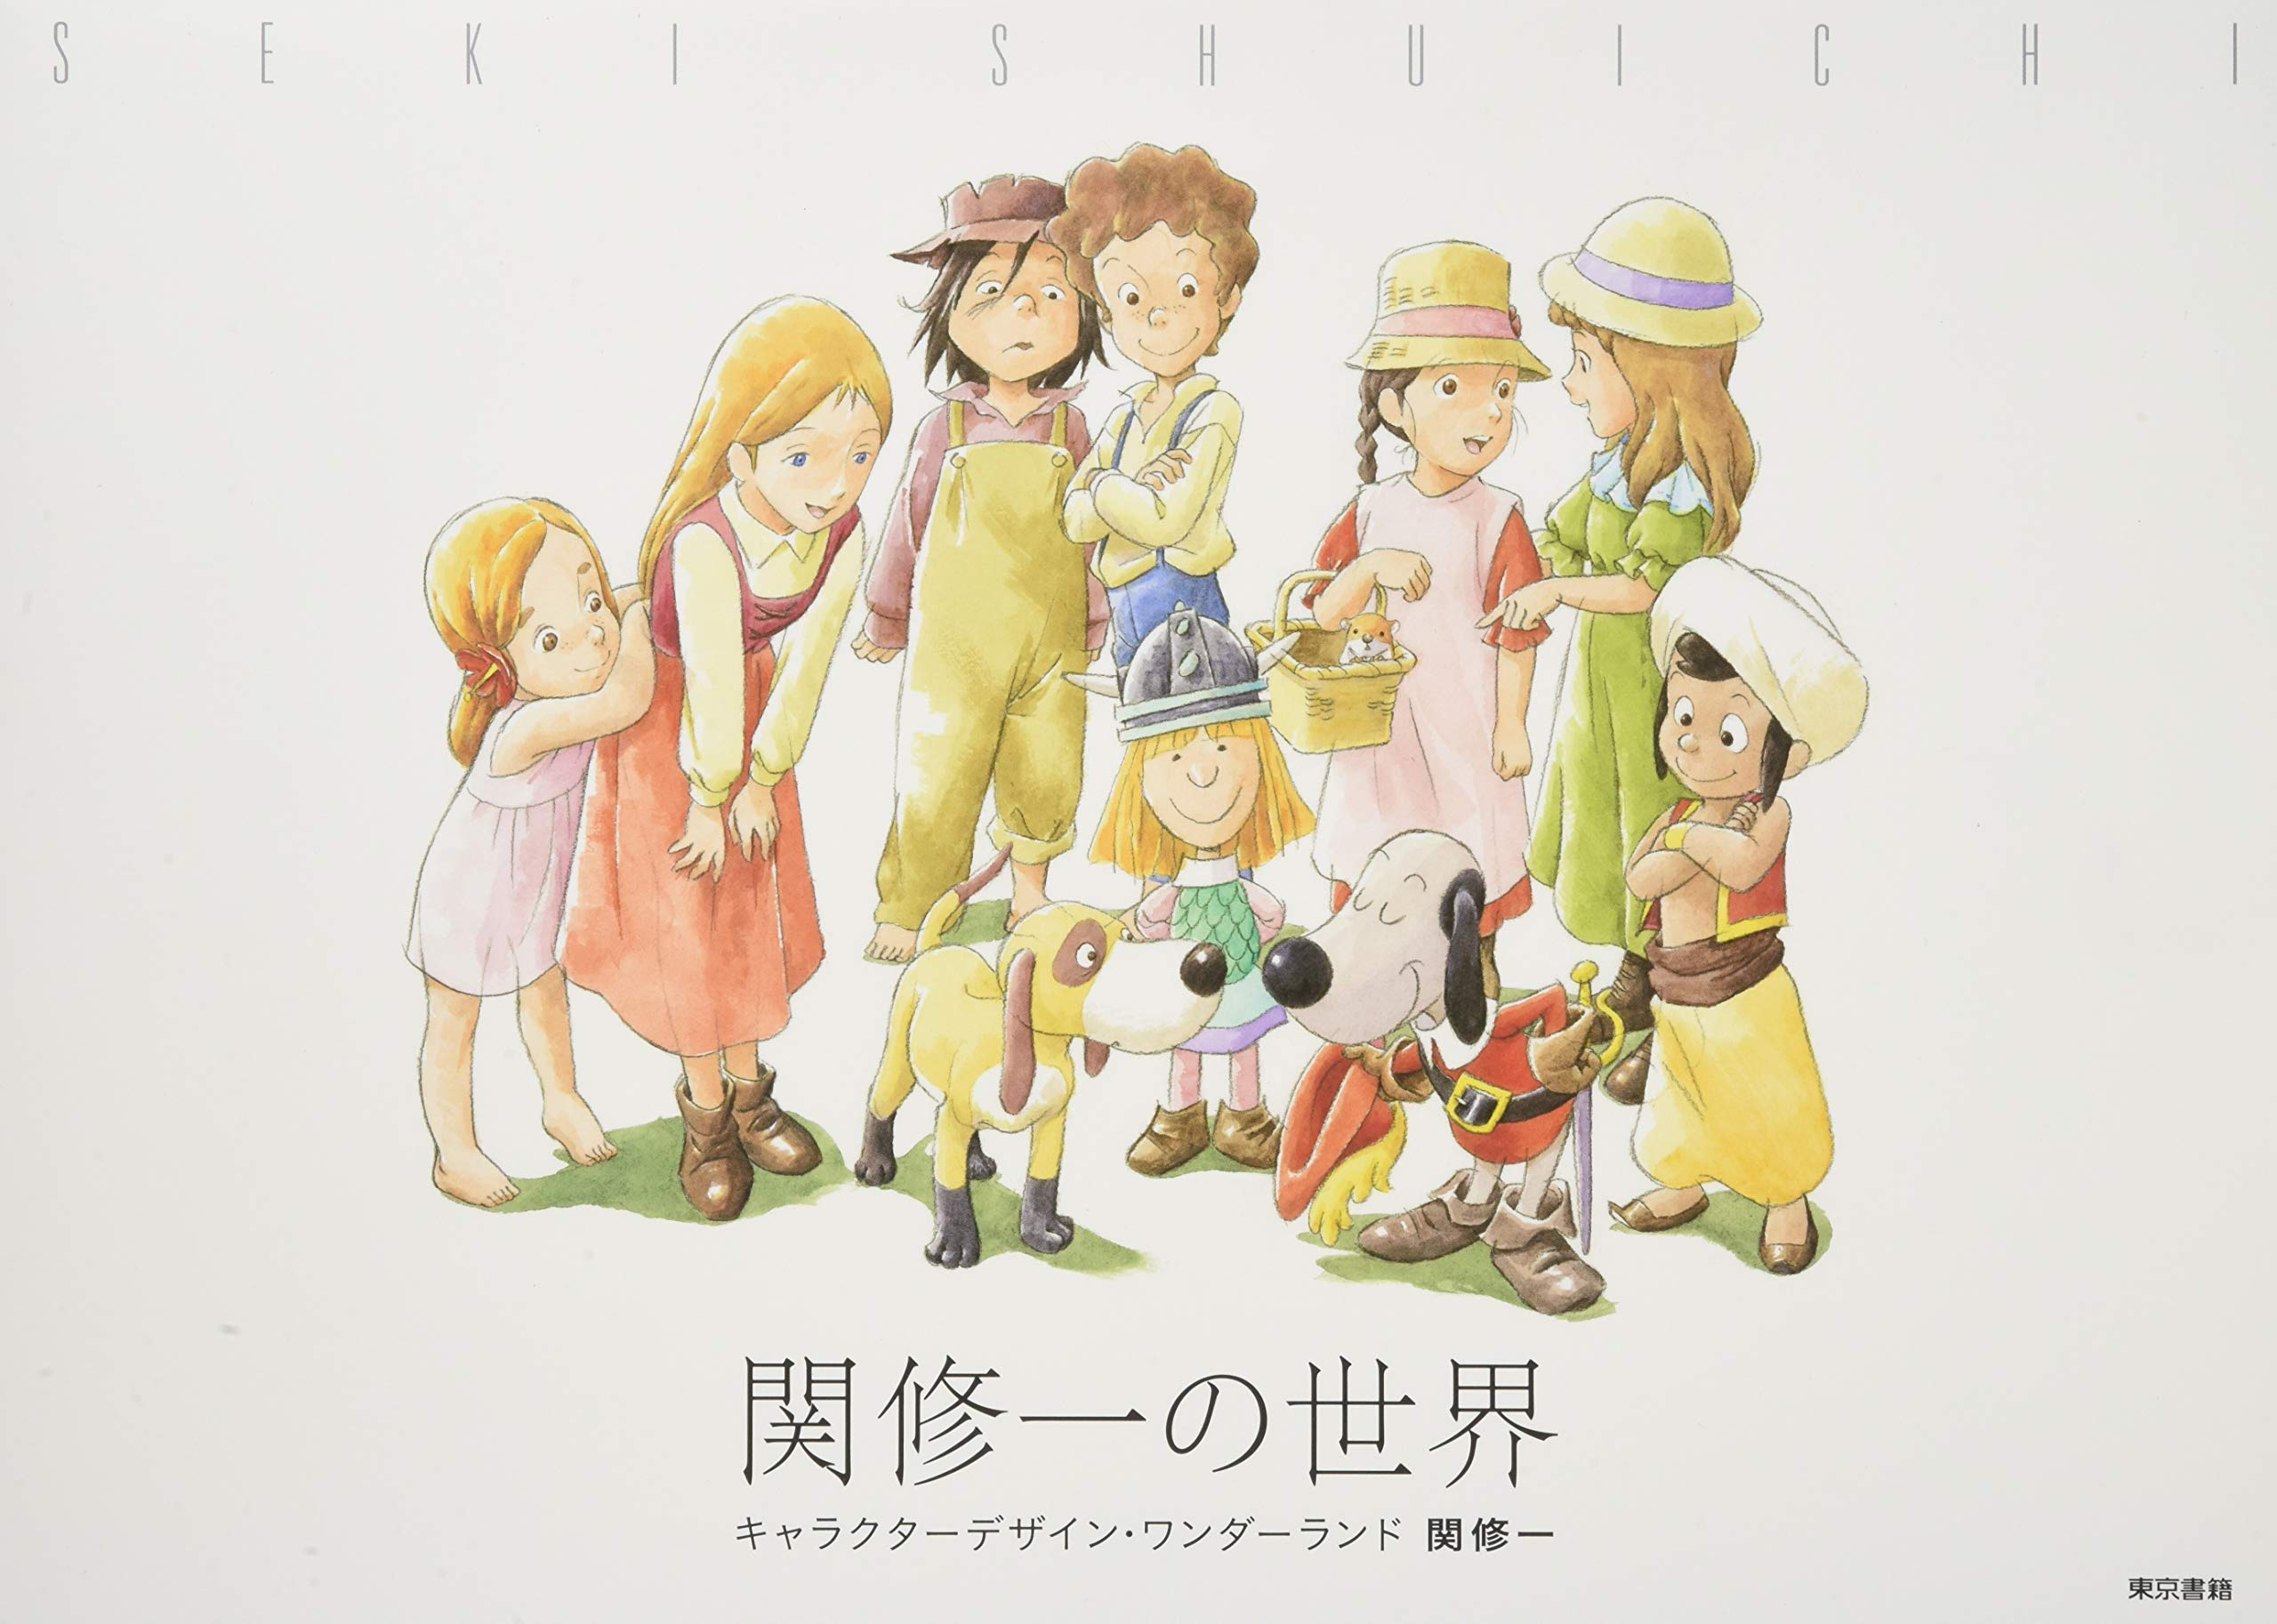 2019 The Adventures of Tom Sawyer Shuichi Seki Character Design Wonderland Book